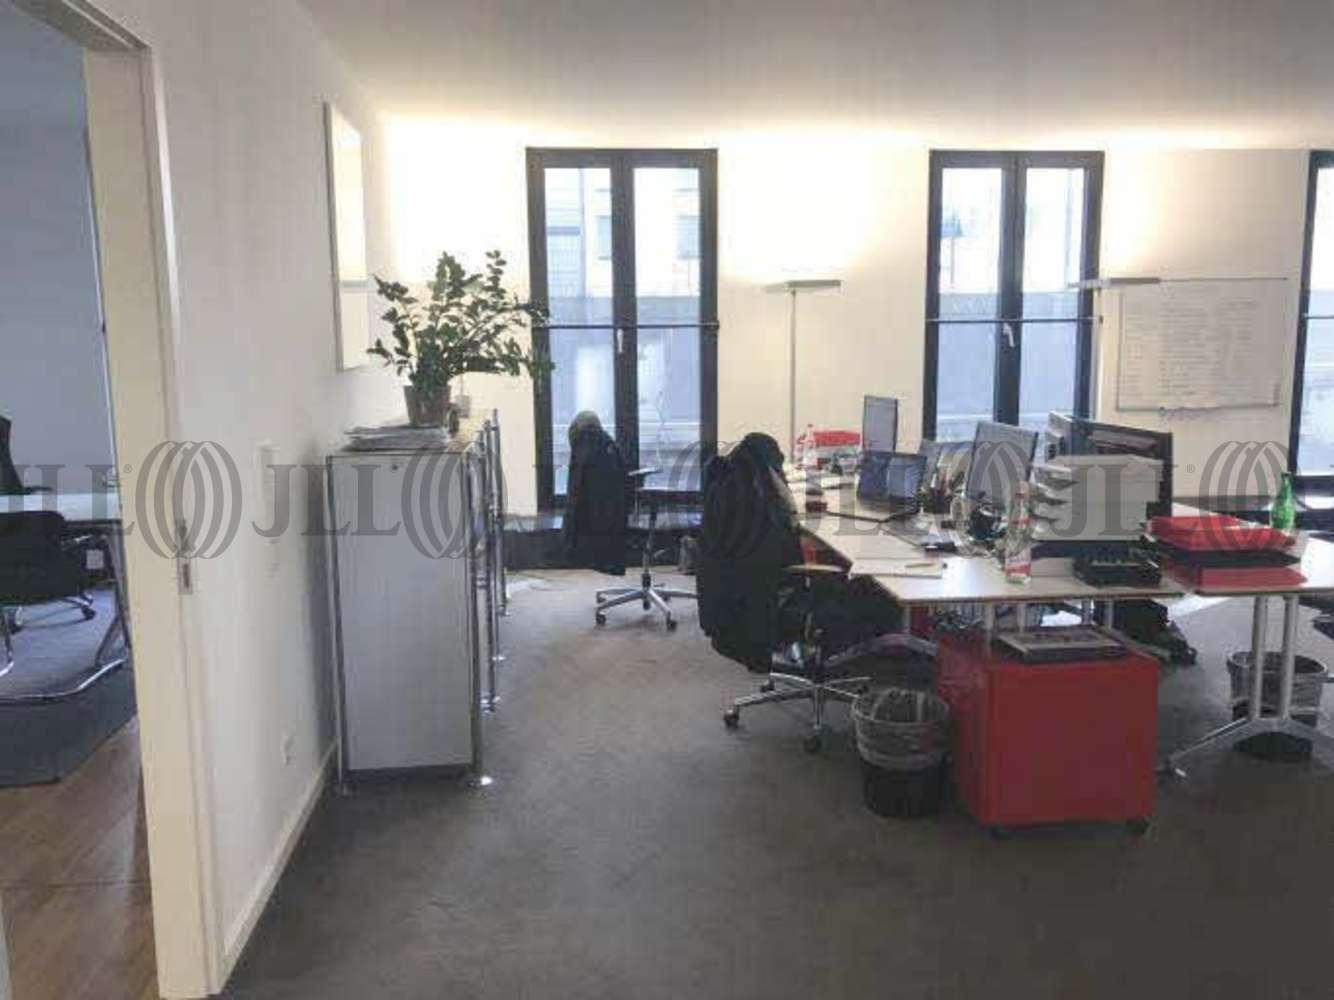 Büros Frankfurt am main, 60329 - Büro - Frankfurt am Main, Bahnhofsviertel - F0050 - 10890334